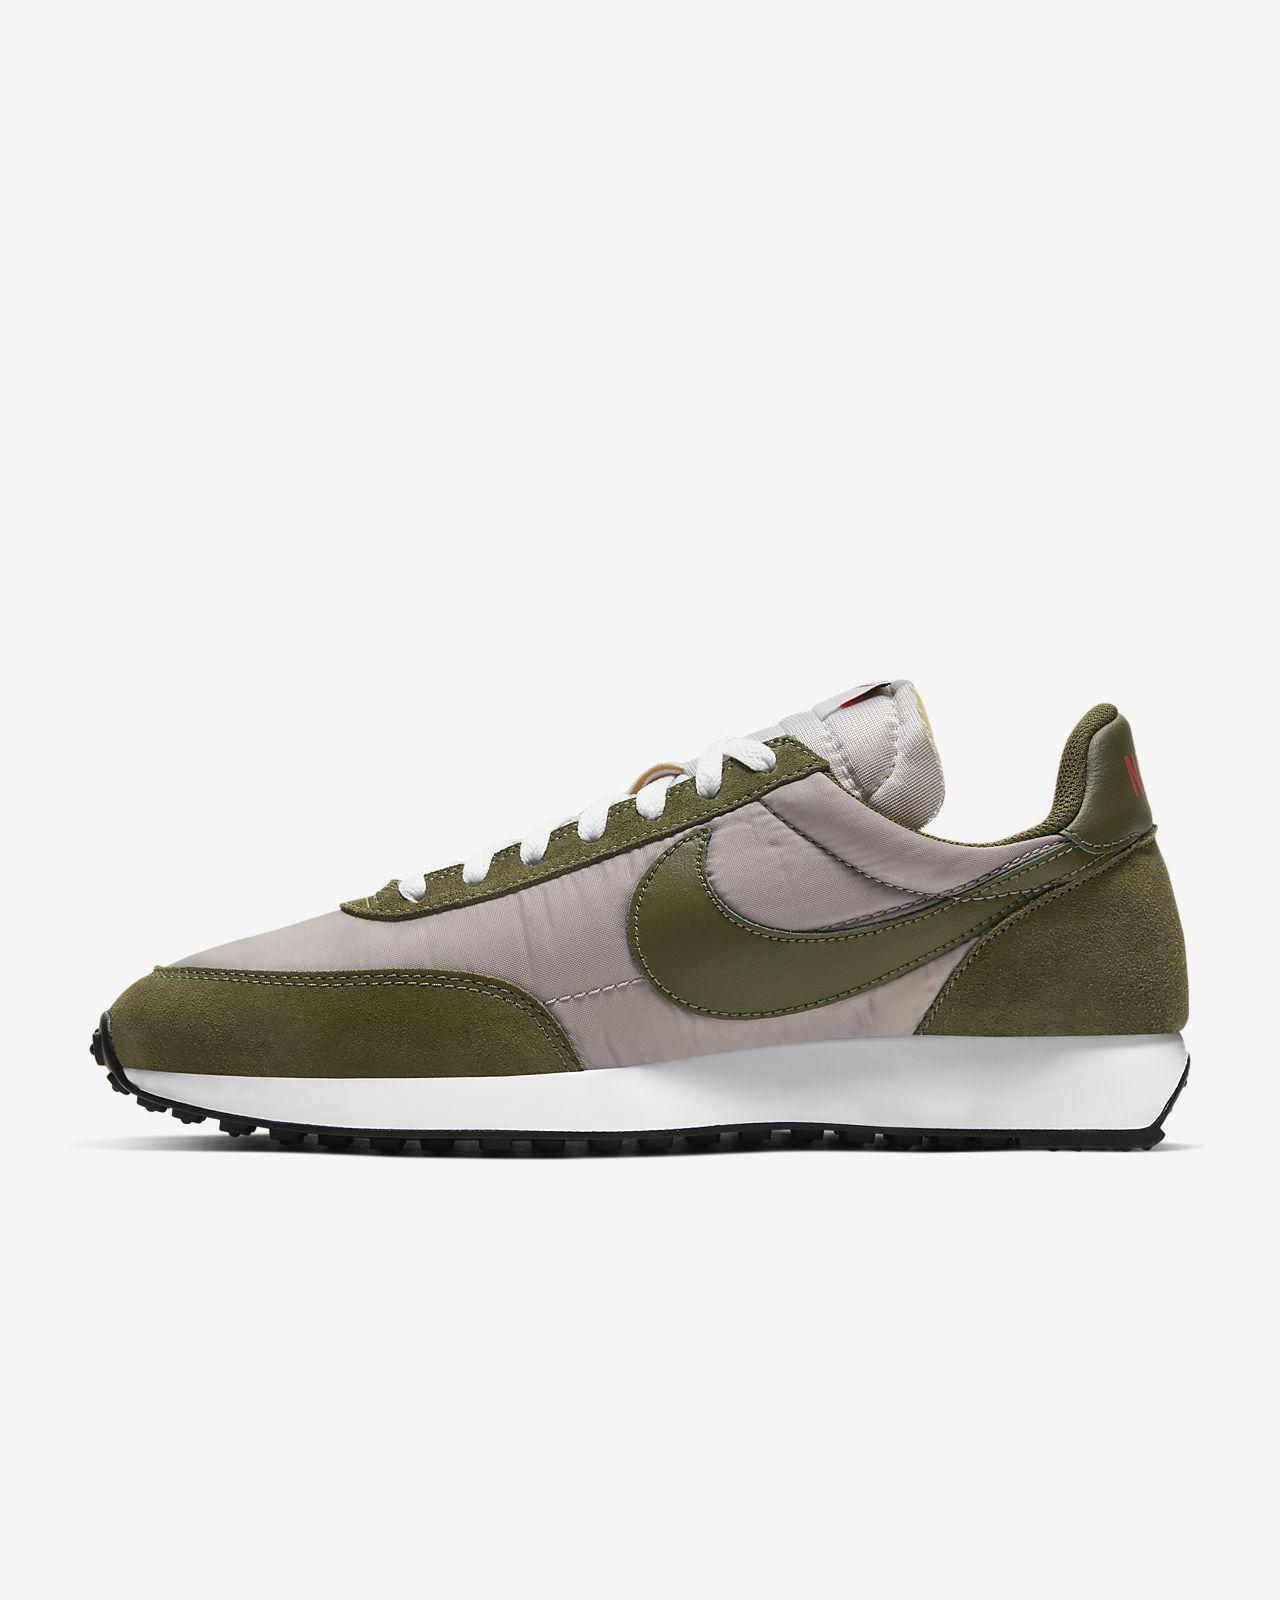 Sapatilhas Nike Air Tailwind 79